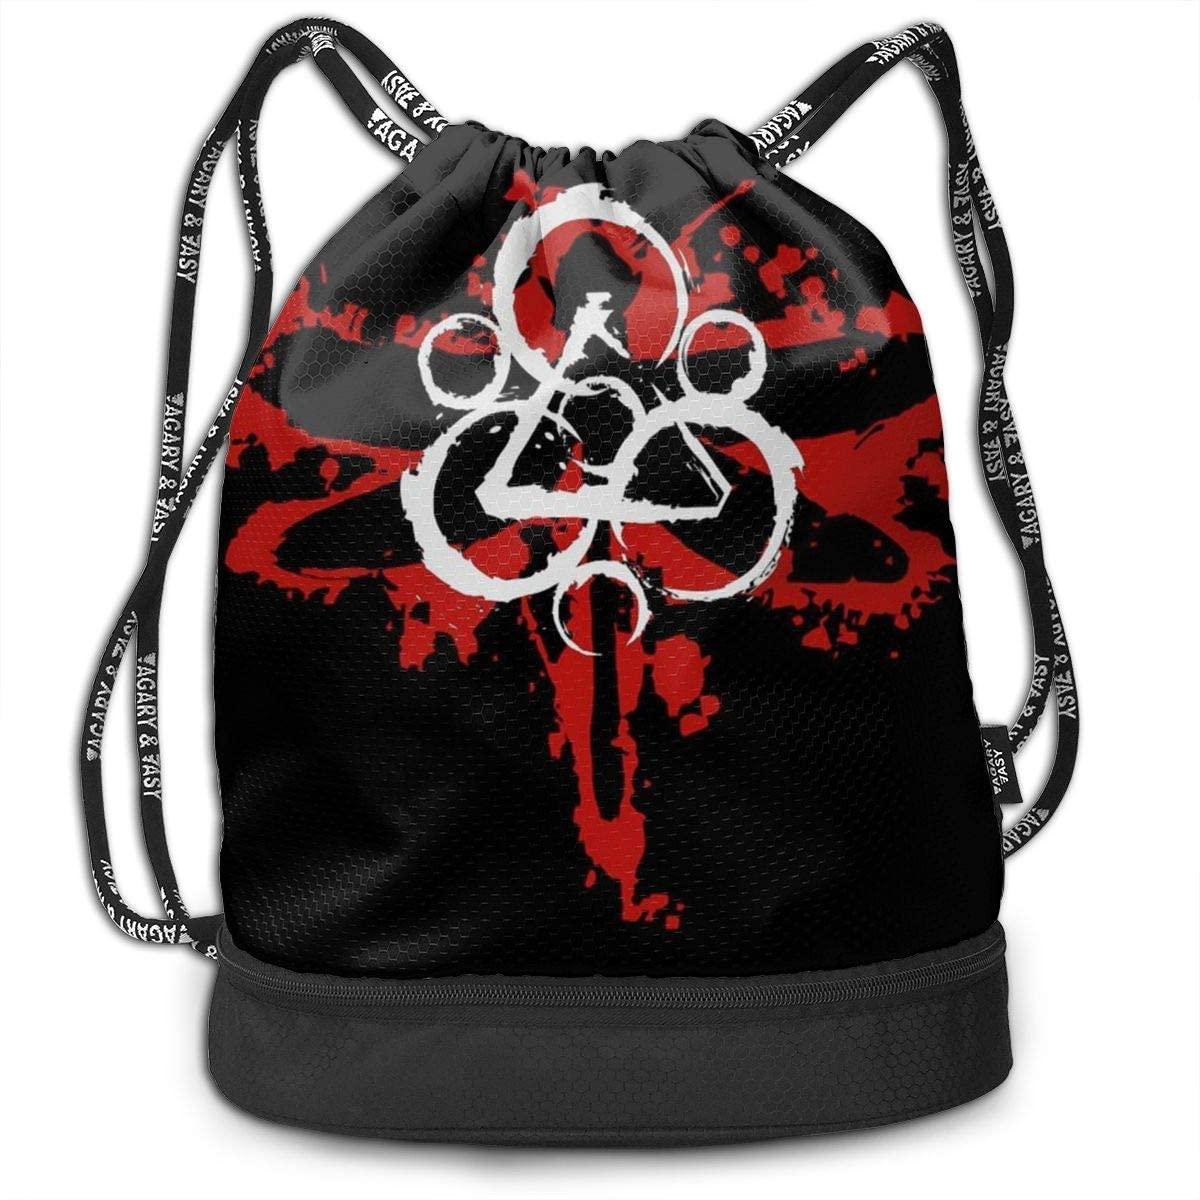 Coheed And Cambria Drawstring Backpack Bag Sport Gym Sackpack Unisex Short Trip Bundle Backpack